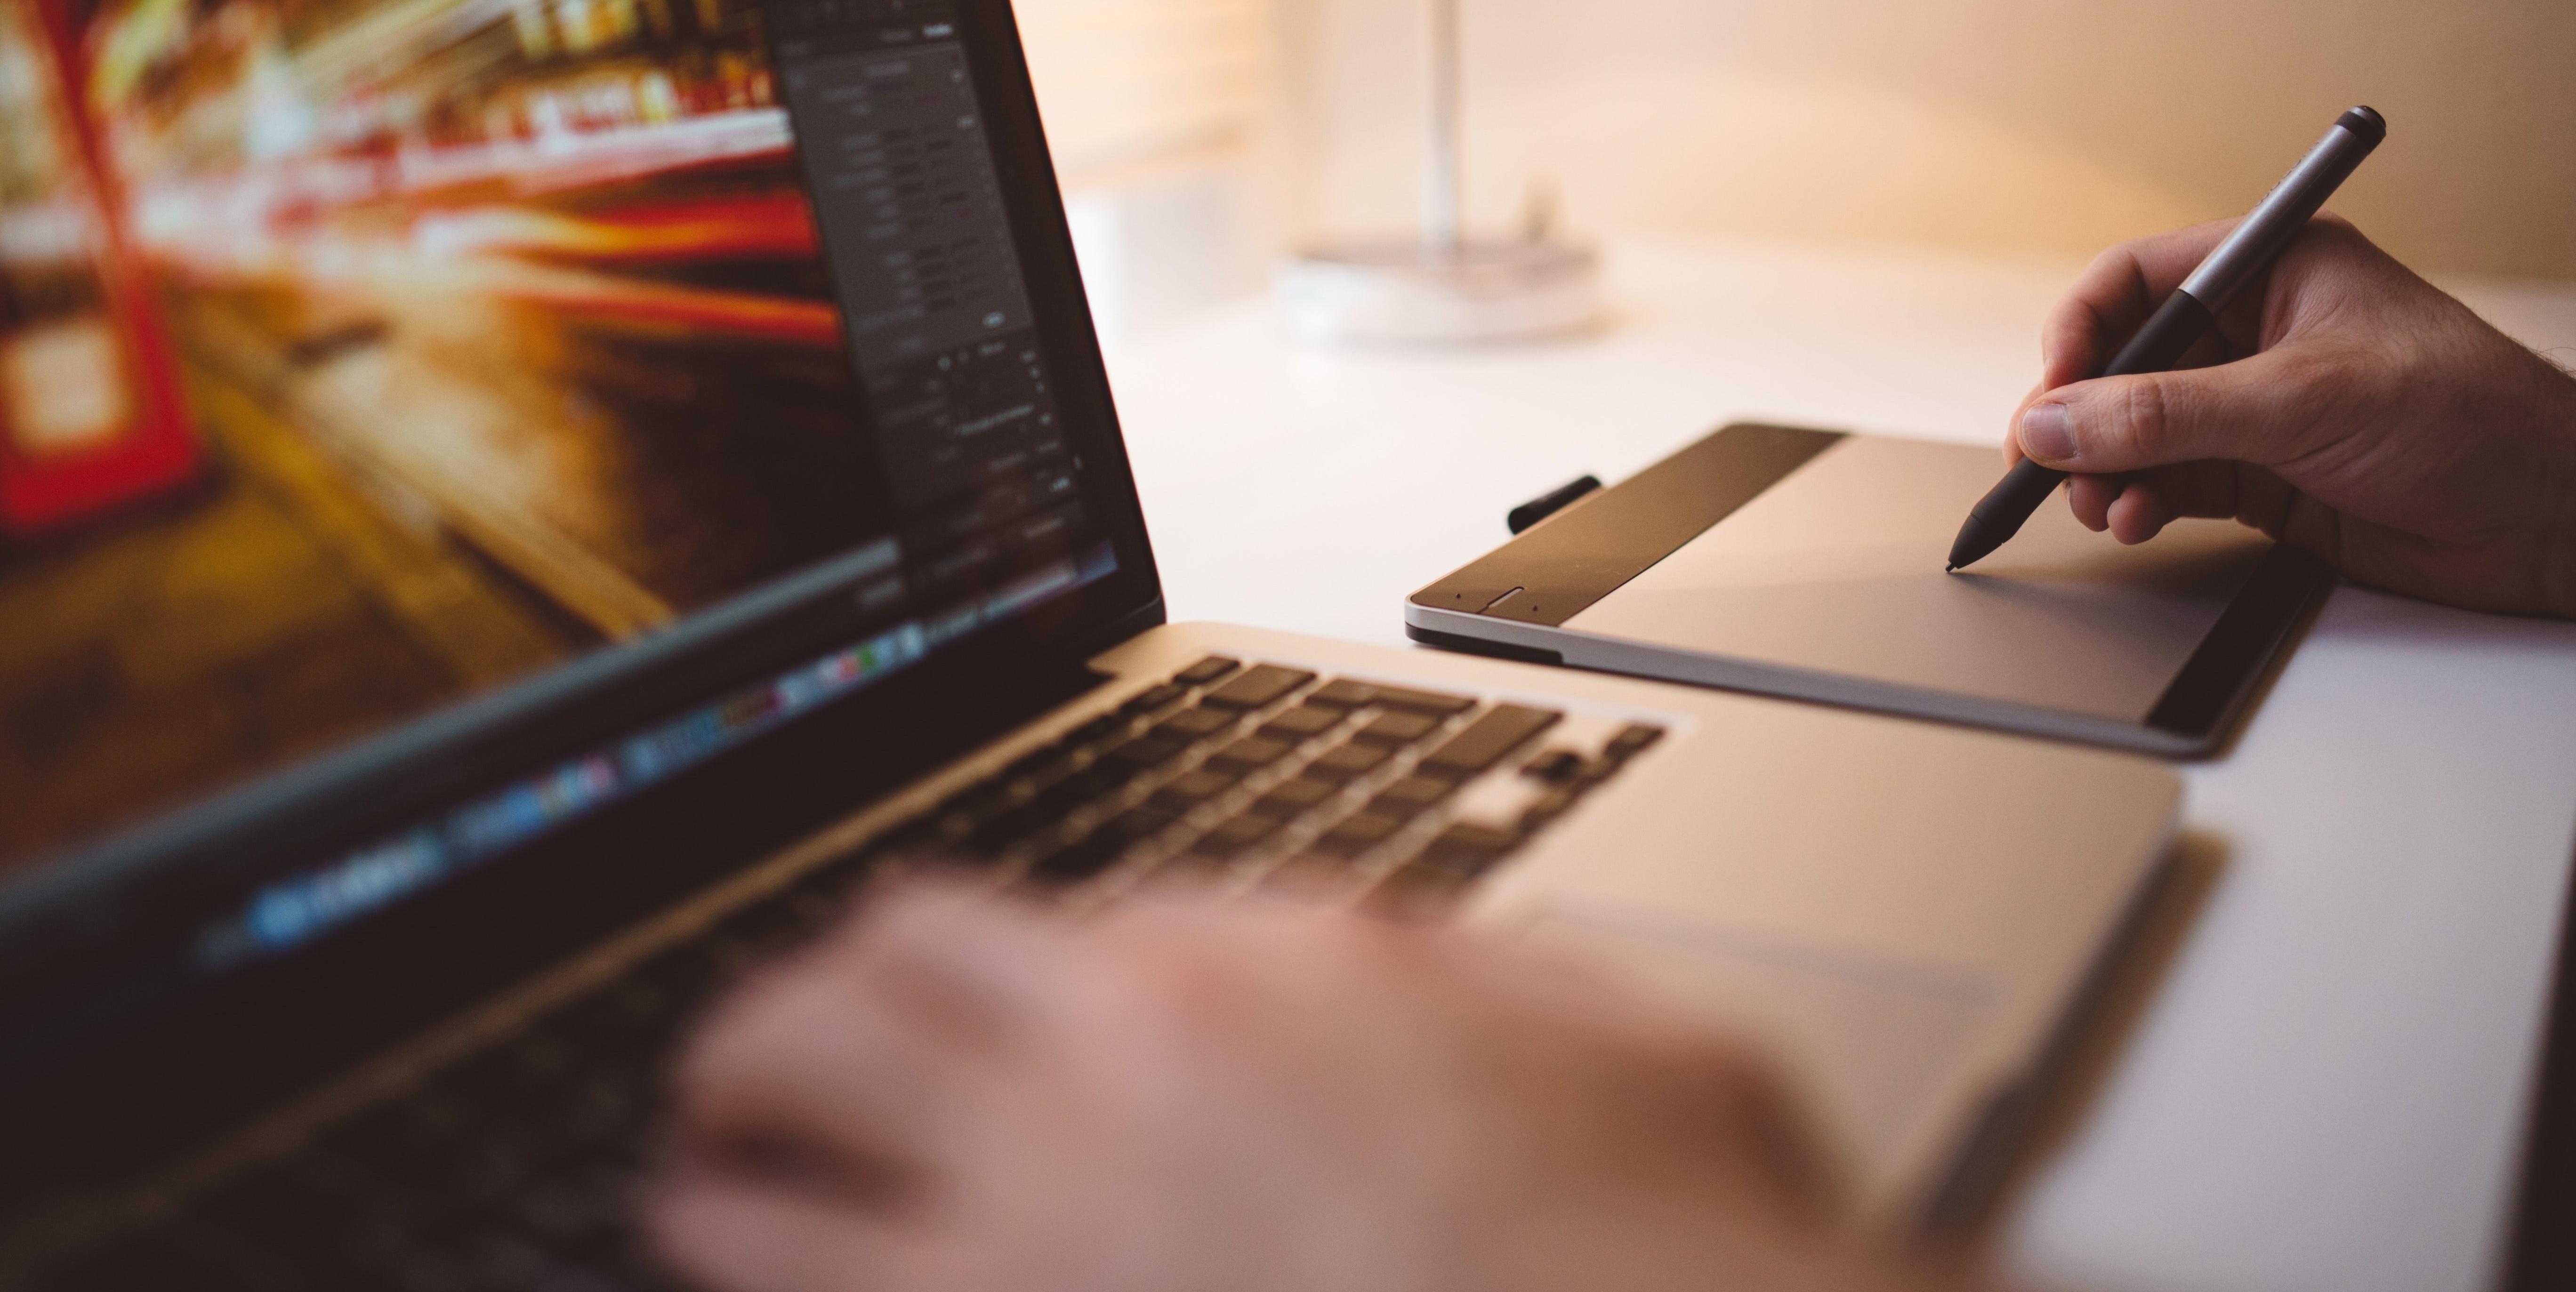 designer_editing_picture_on_laptop-353030-edited